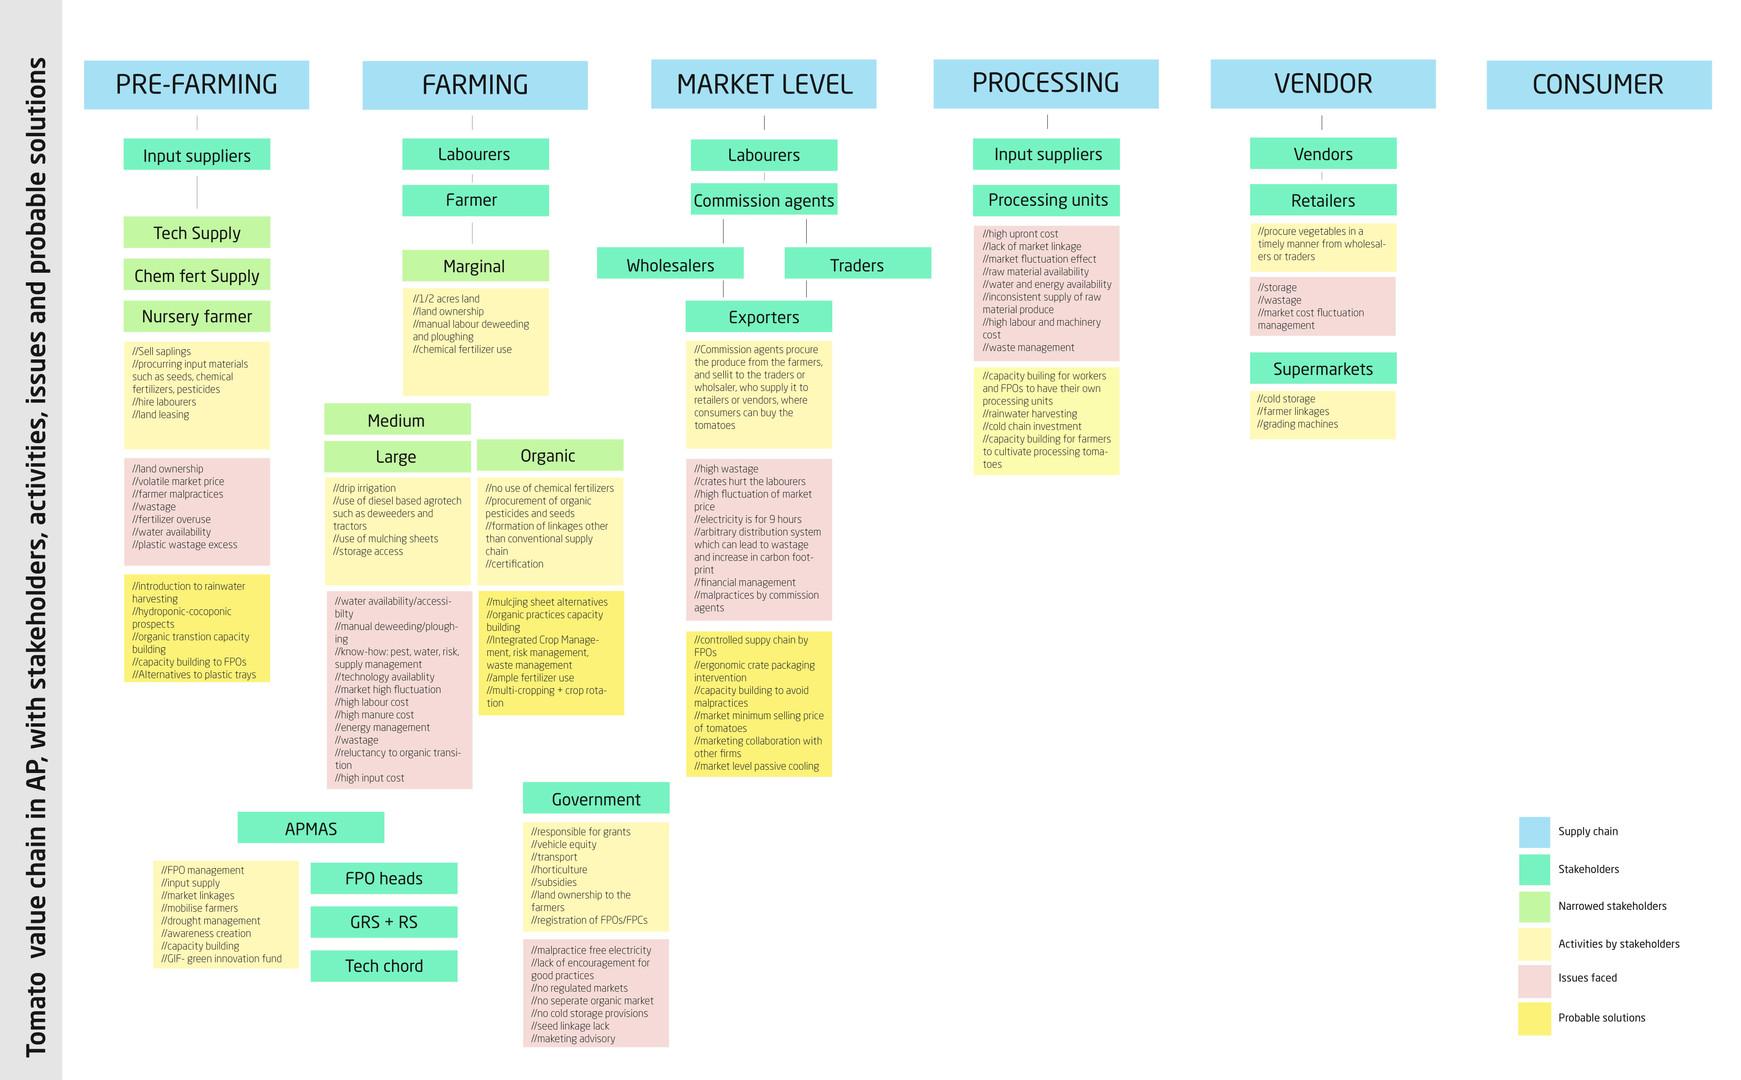 3. Journey Map_SELCO Foundation_APMAS-pa